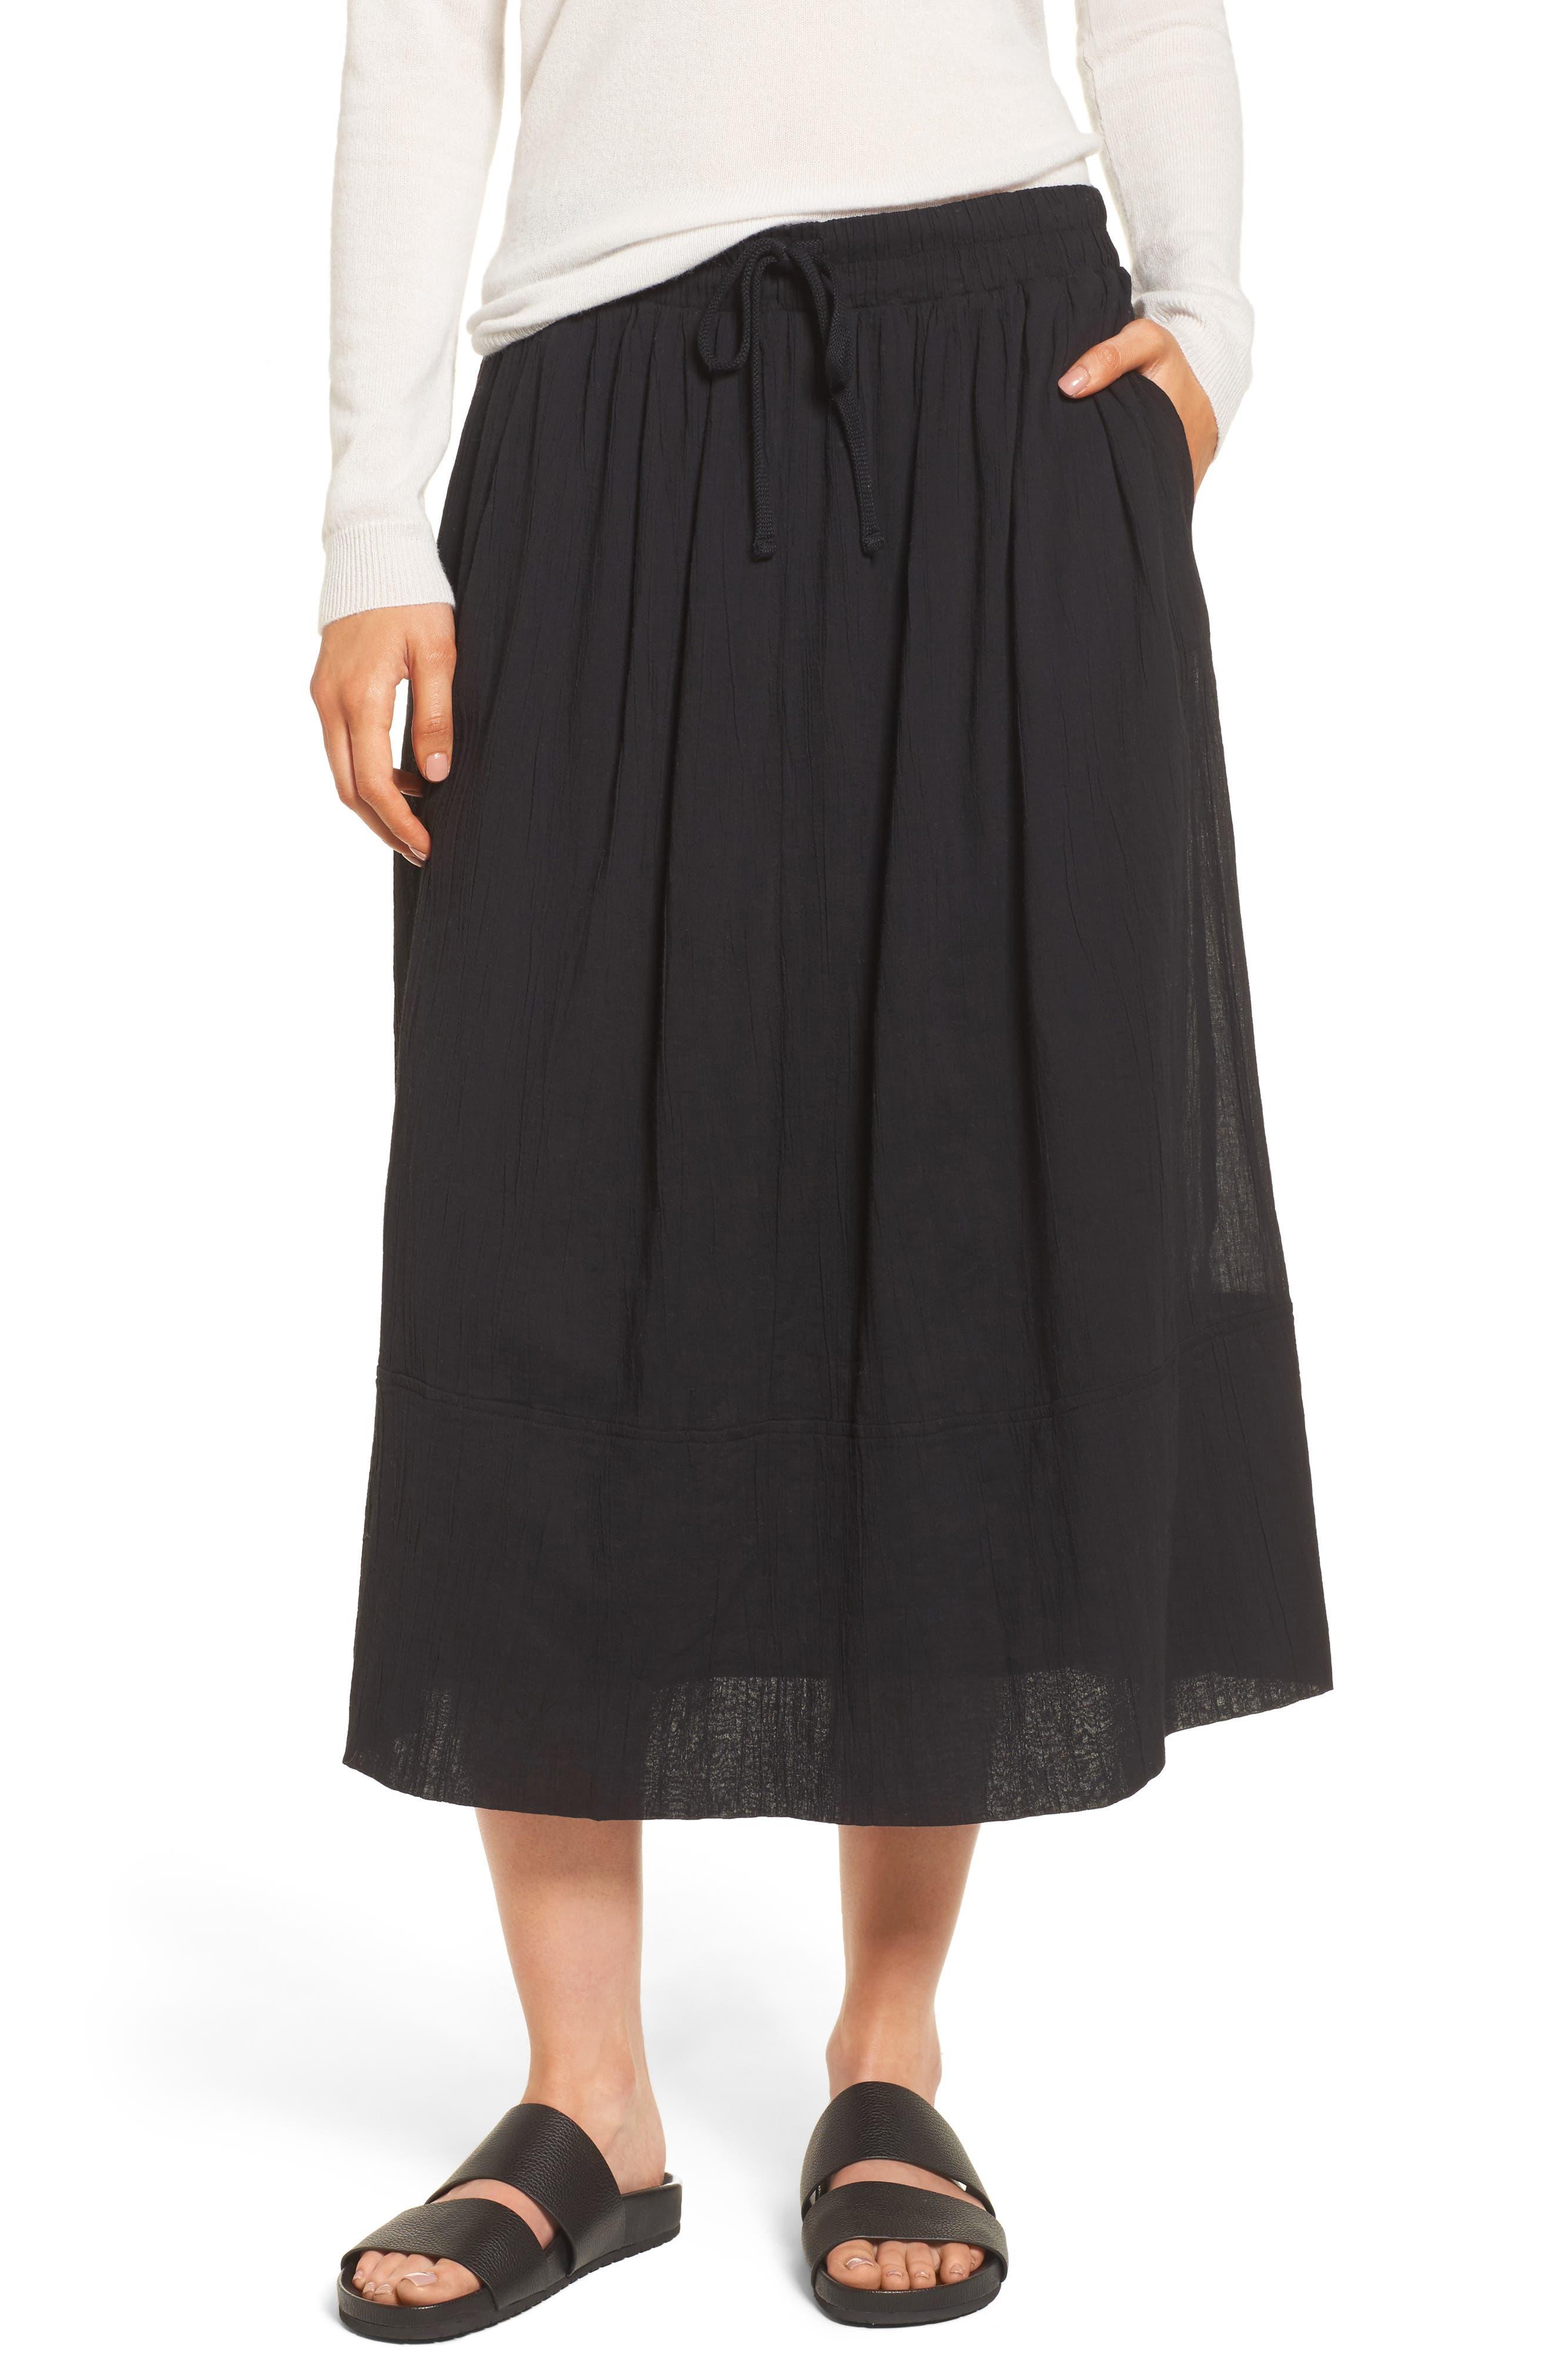 James Perse Gauze Midi Skirt